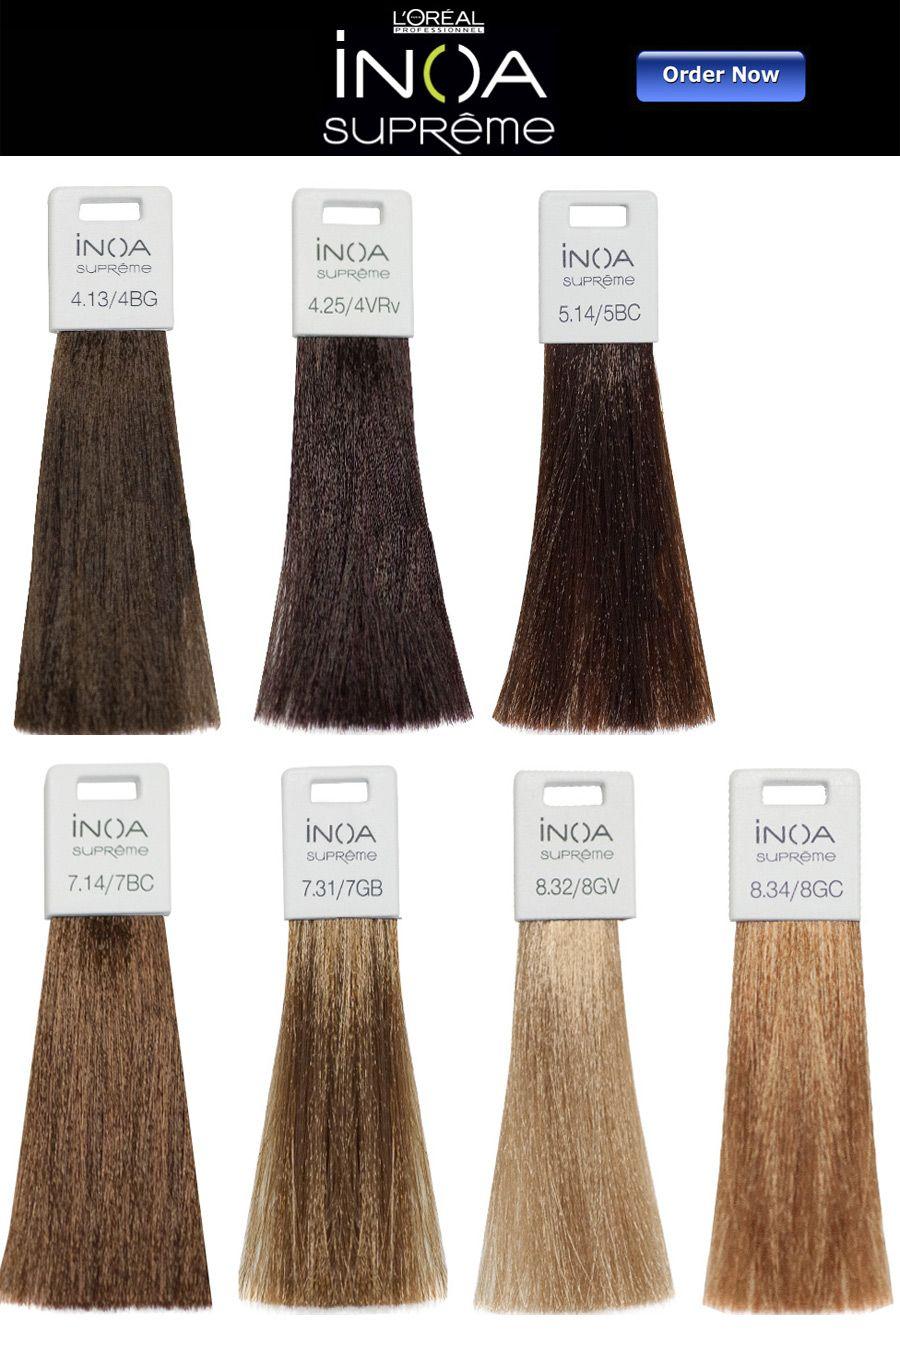 L Oreal Inoa Supreme Hair Color Chart In 2021 Loreal Hair Color Hair Color Chart Loreal Hair Color Chart